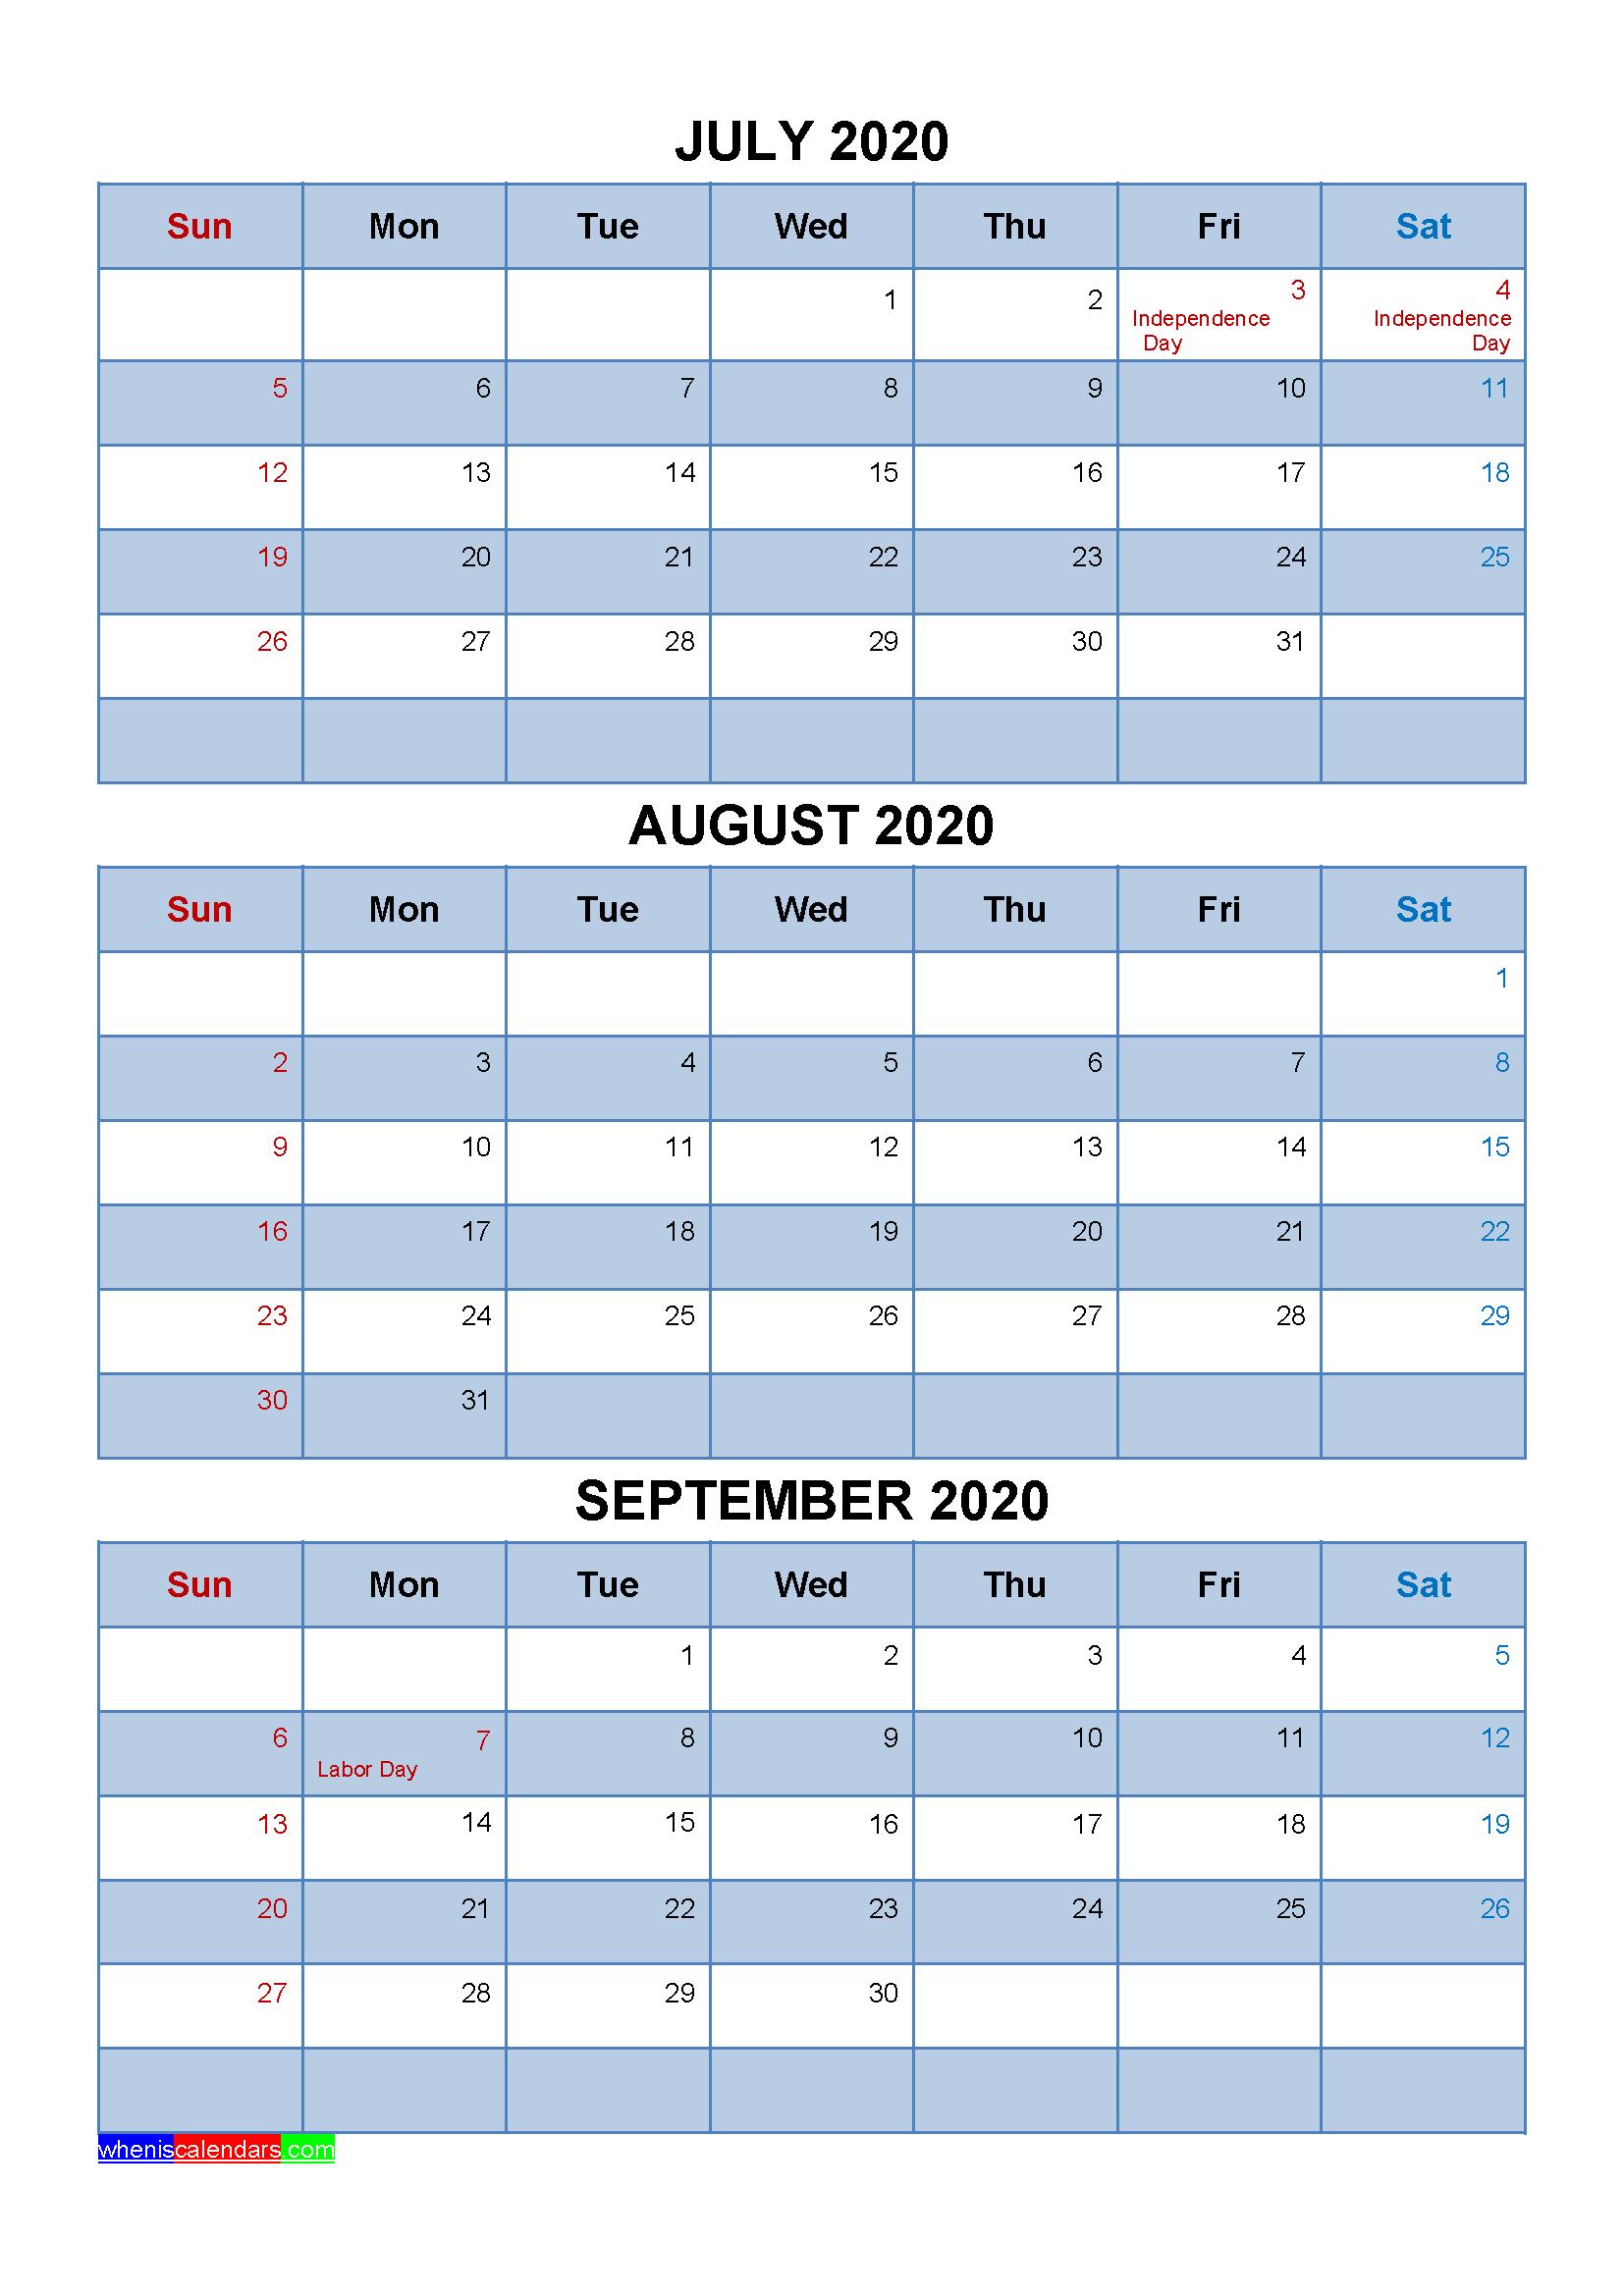 Free July August September 2020 Printable Calendar Template inside Quarterly Calendar Template